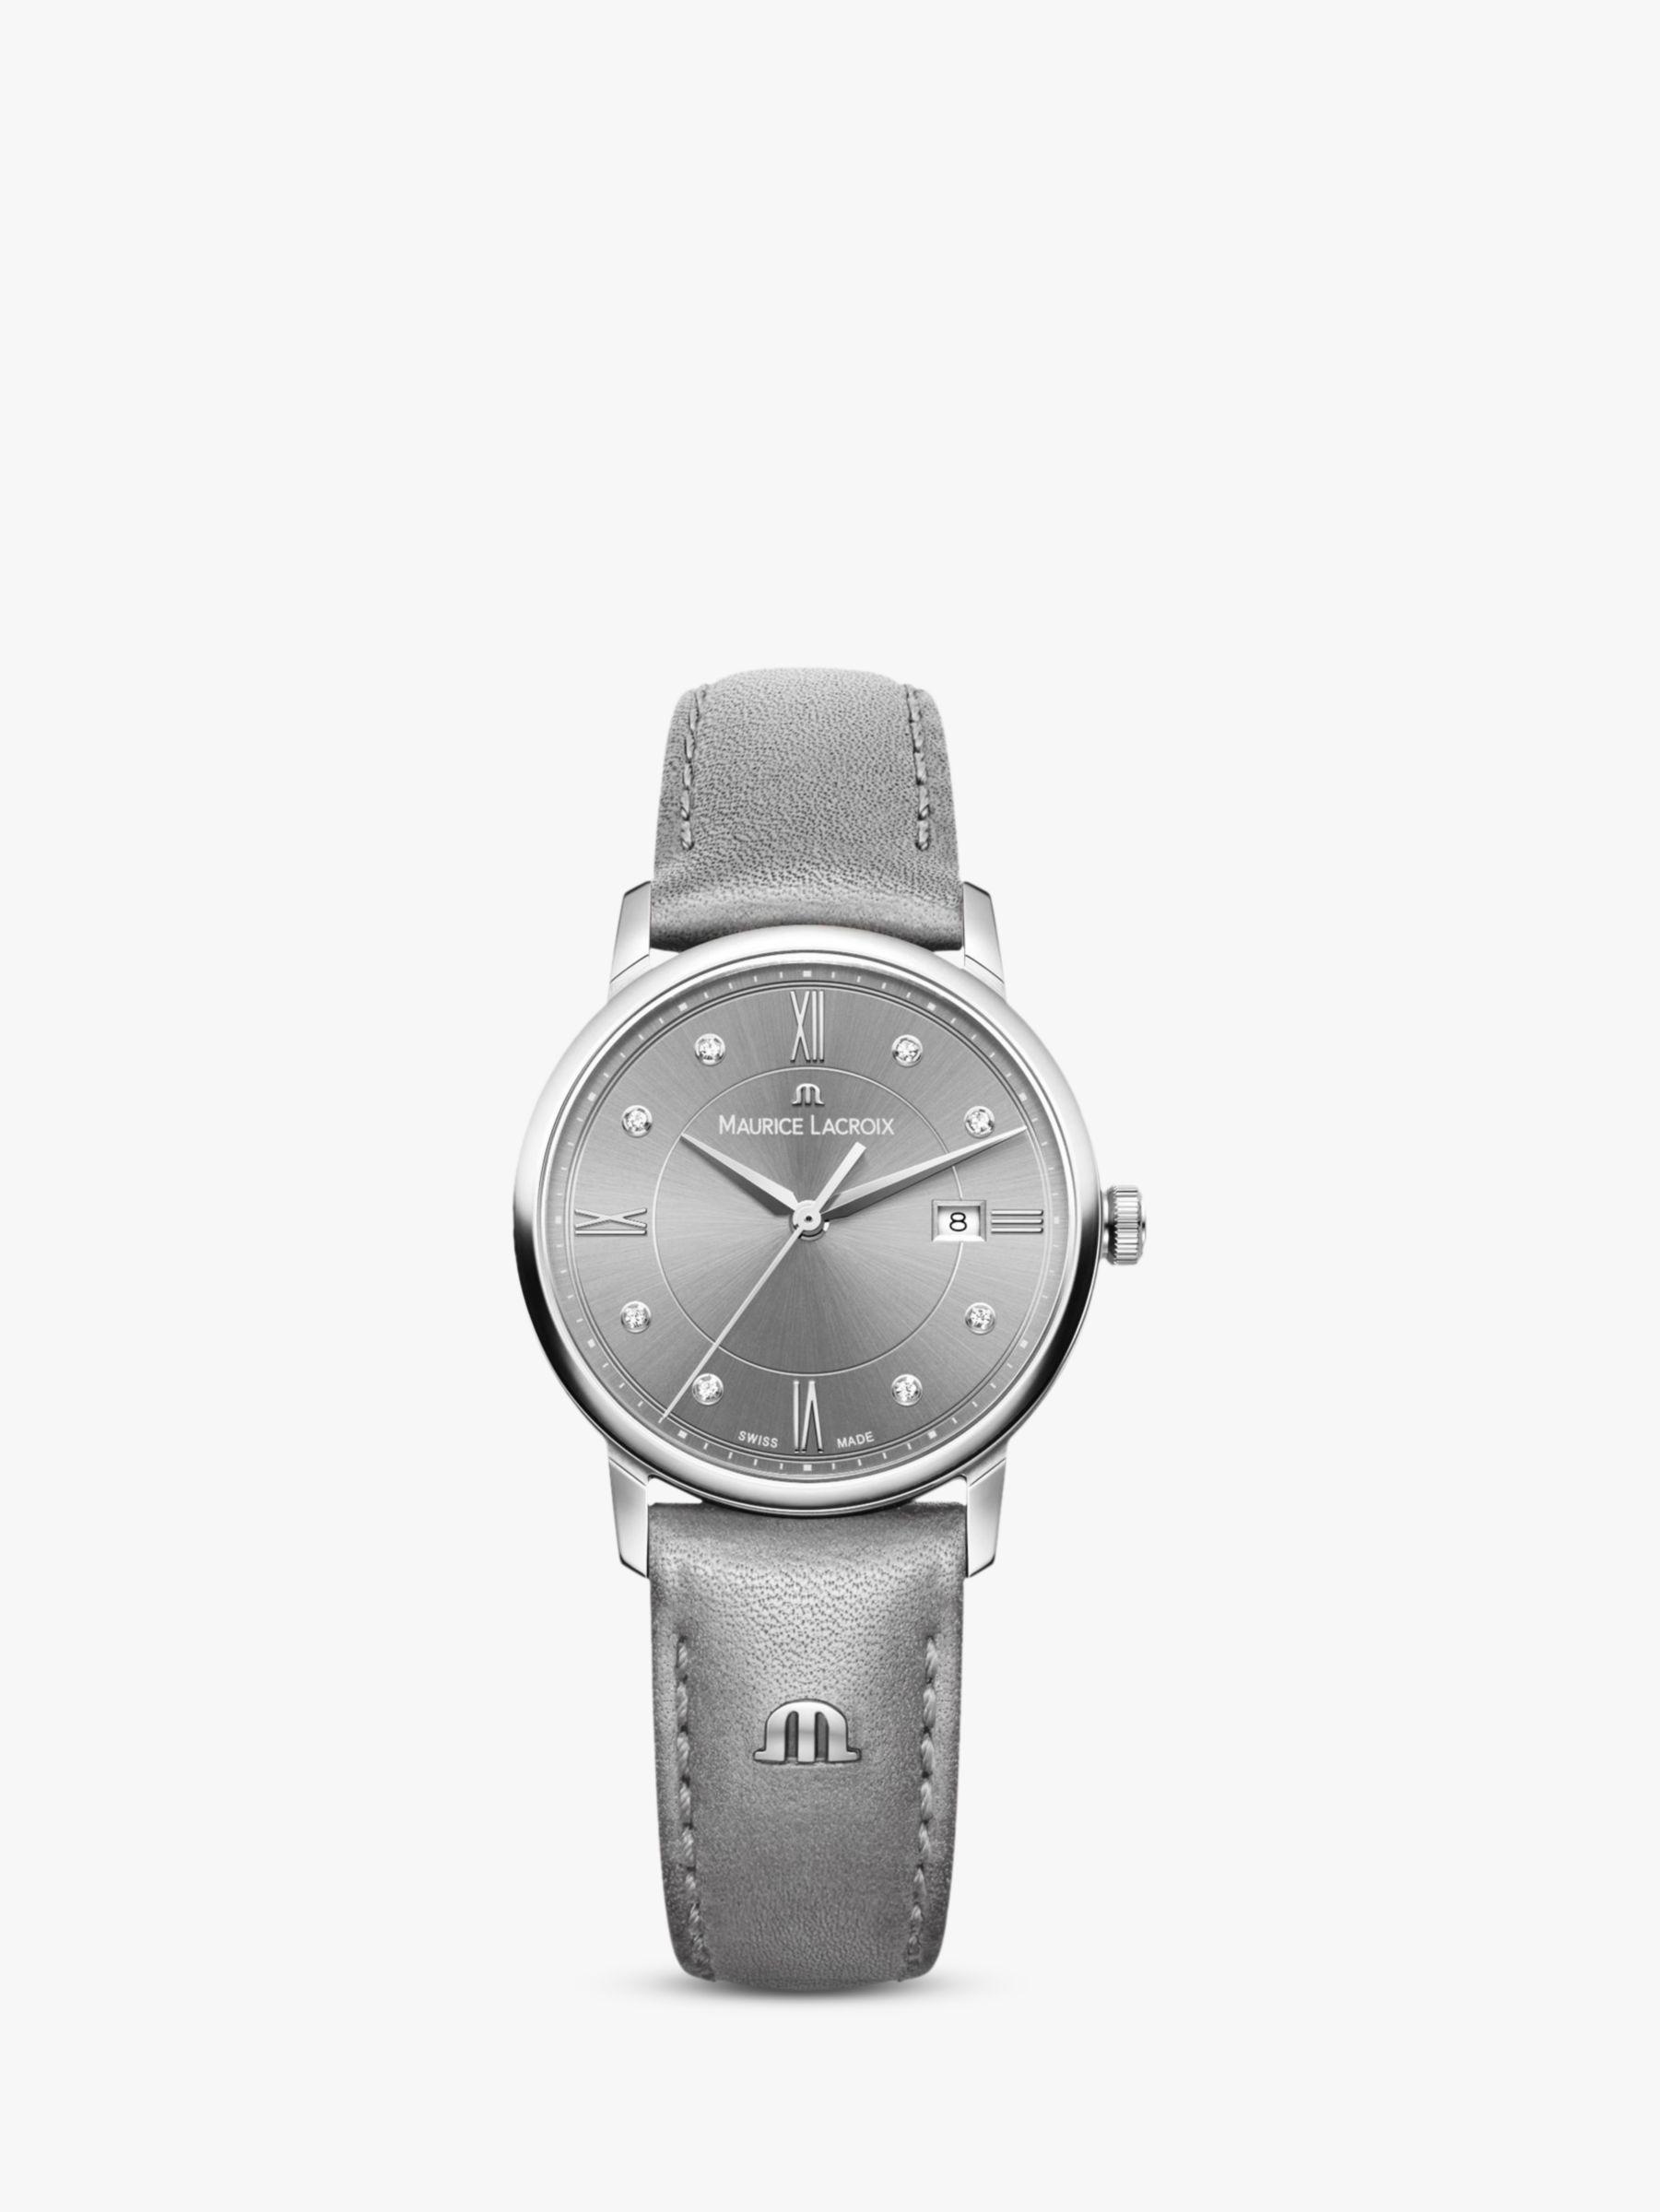 Maurice Lacroix Maurice Lacroix EL1094-SS001-250-1 Women's Eliros Diamond Date Leather Strap Watch, Grey/Silver